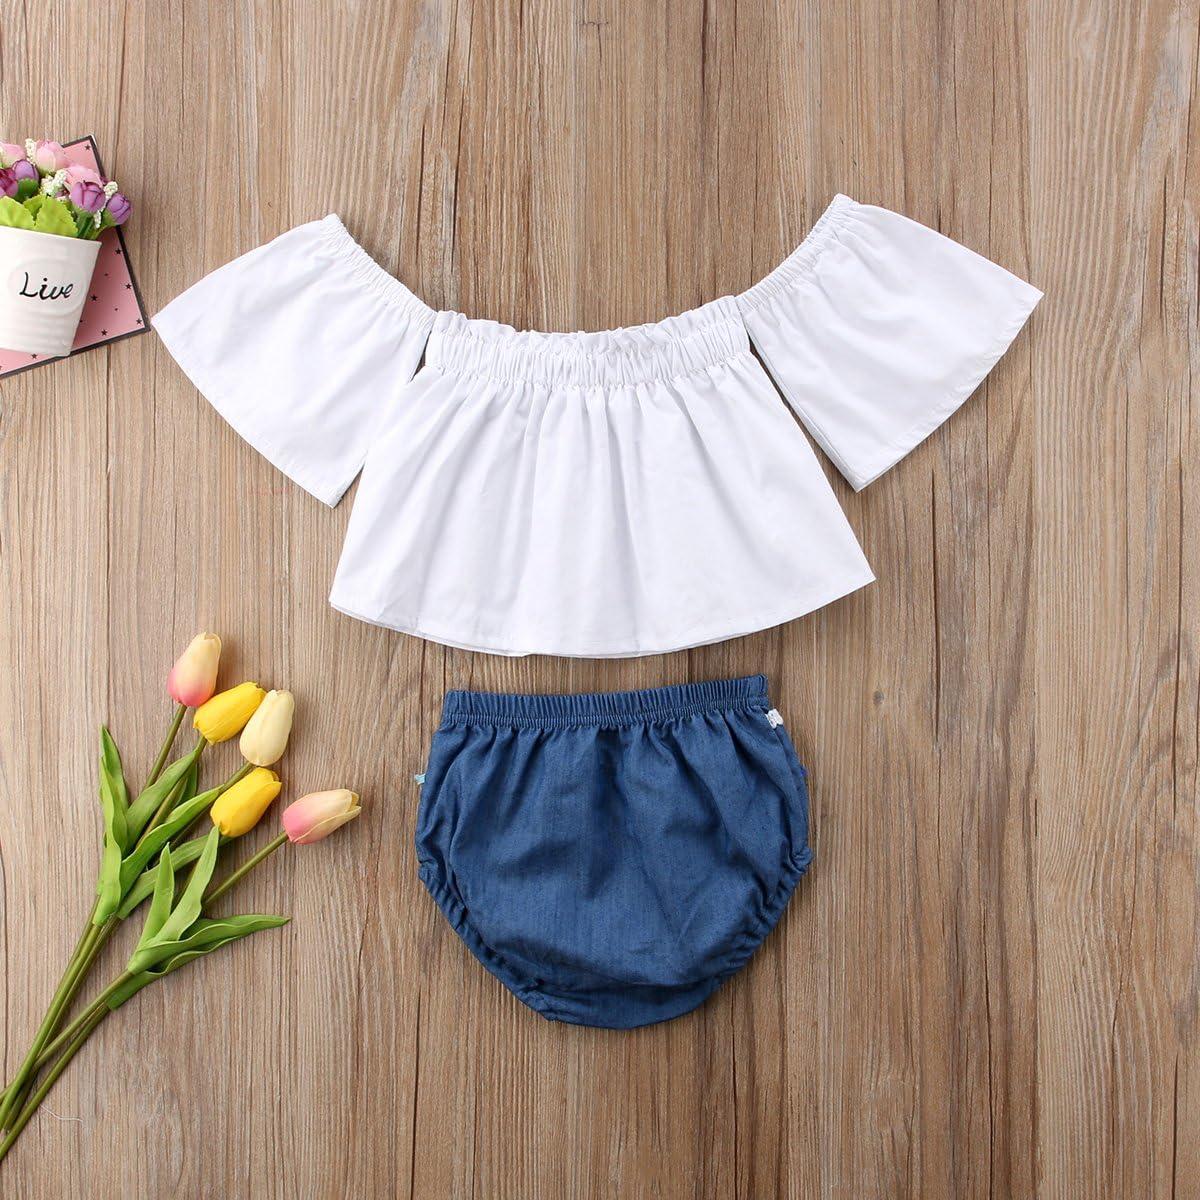 Urkutoba Baby Girls Summer Off Shoulder Ruffle Bell Sleeve T-Shirt Tank Tops+Multicolour Tassels Bottom Short Pants Outfits